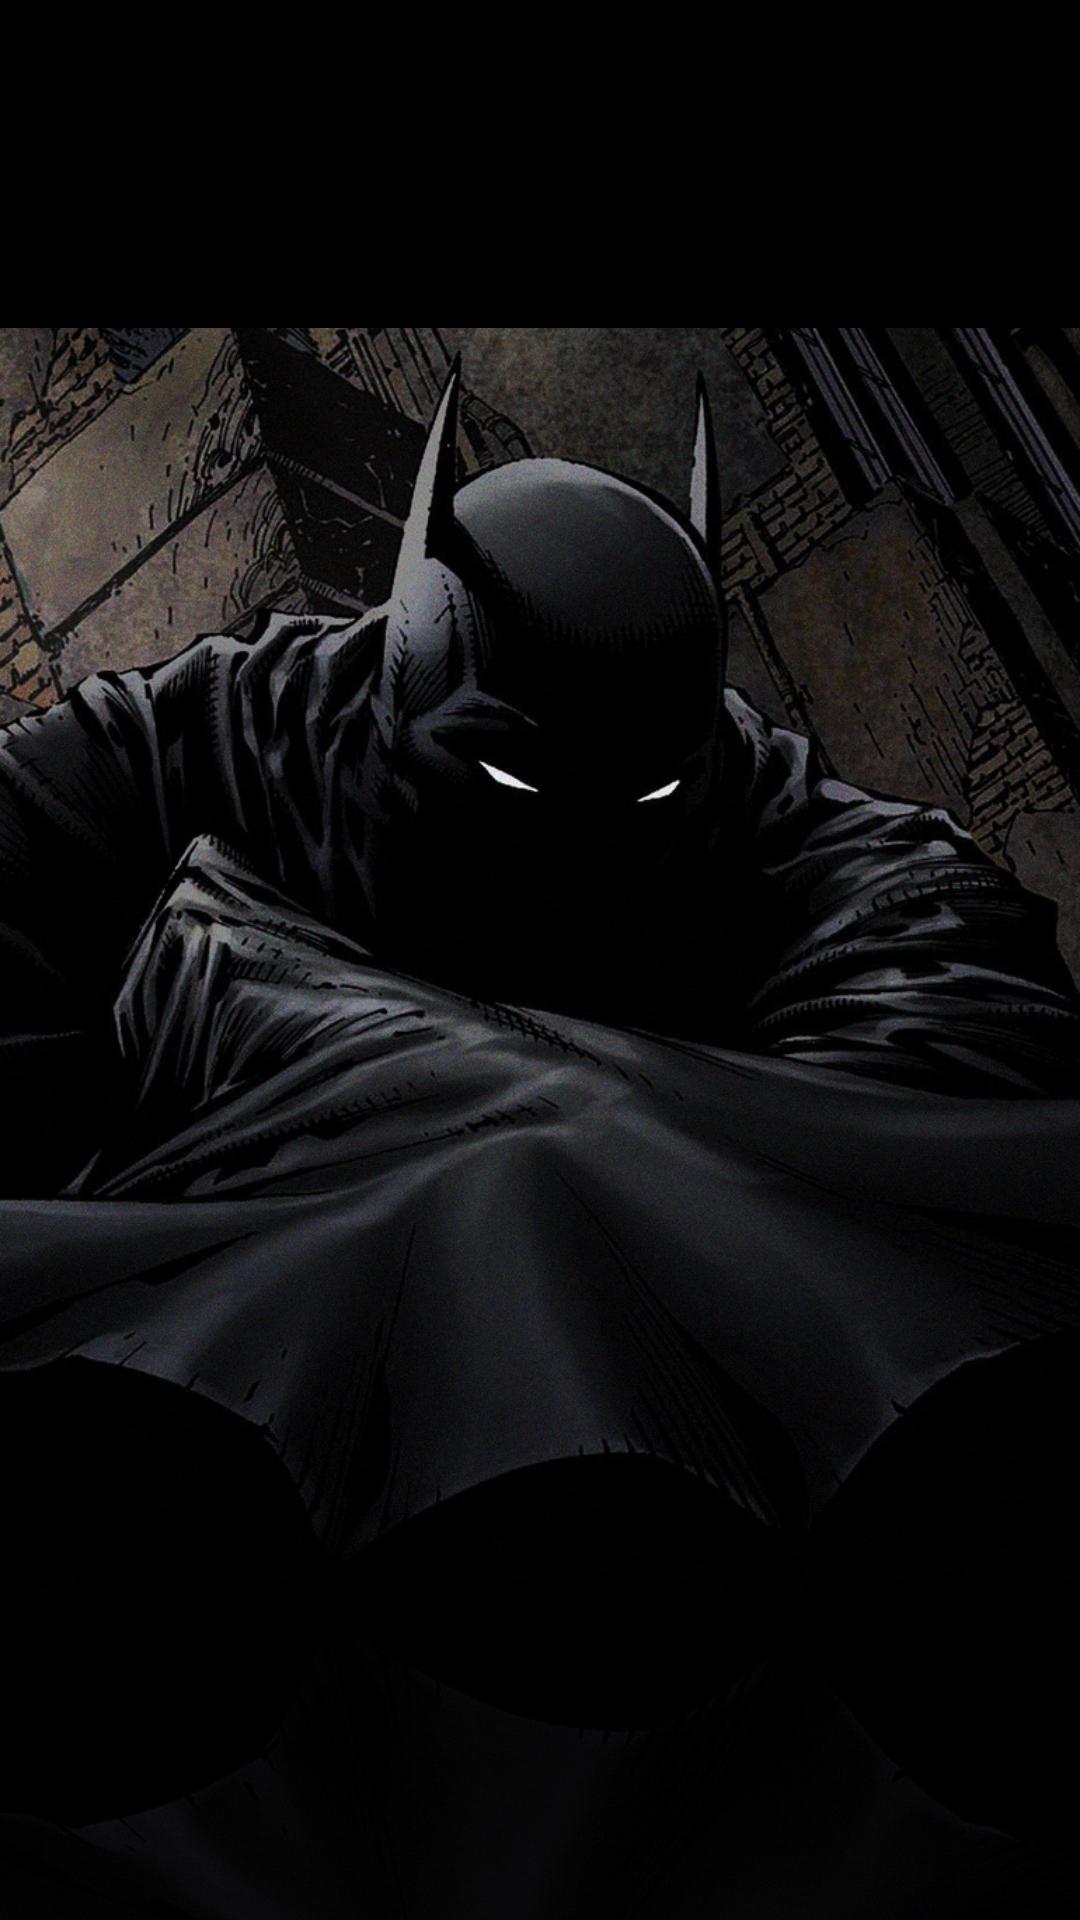 Download Batman Wallpaper For Samsung Galaxy S5 Size 1080 x 1920 1080x1920